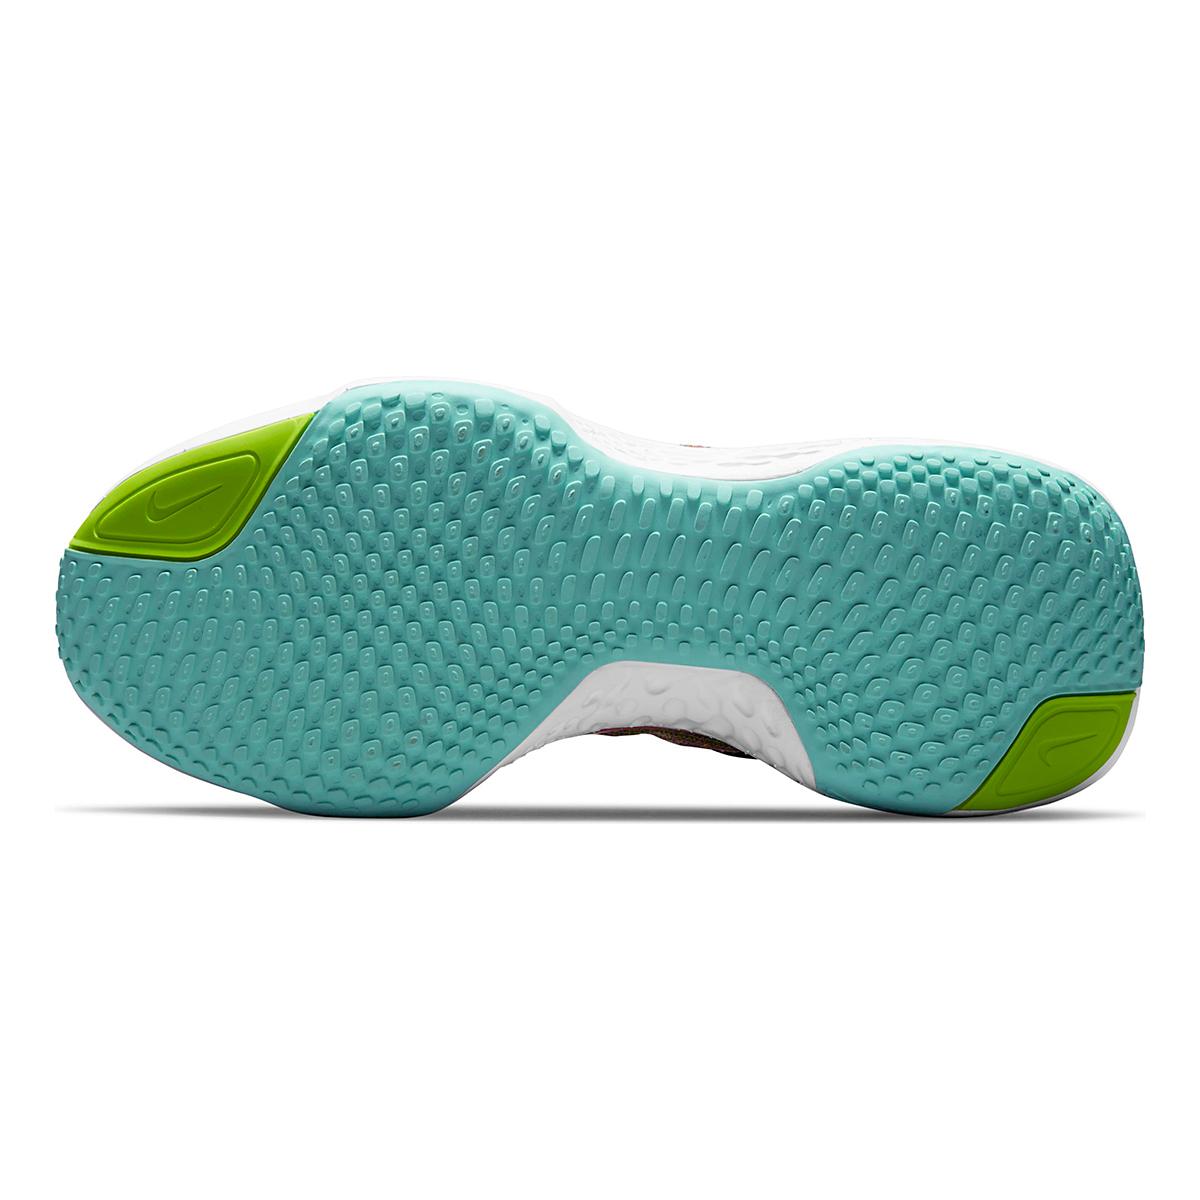 Women's Nike Zoomx Invincible Run FlyKnit Running Shoe - Color: Volt/Bright Mango/Black/Light Dew - Size: 5 - Width: Regular, Volt/Bright Mango/Black/Light Dew, large, image 6